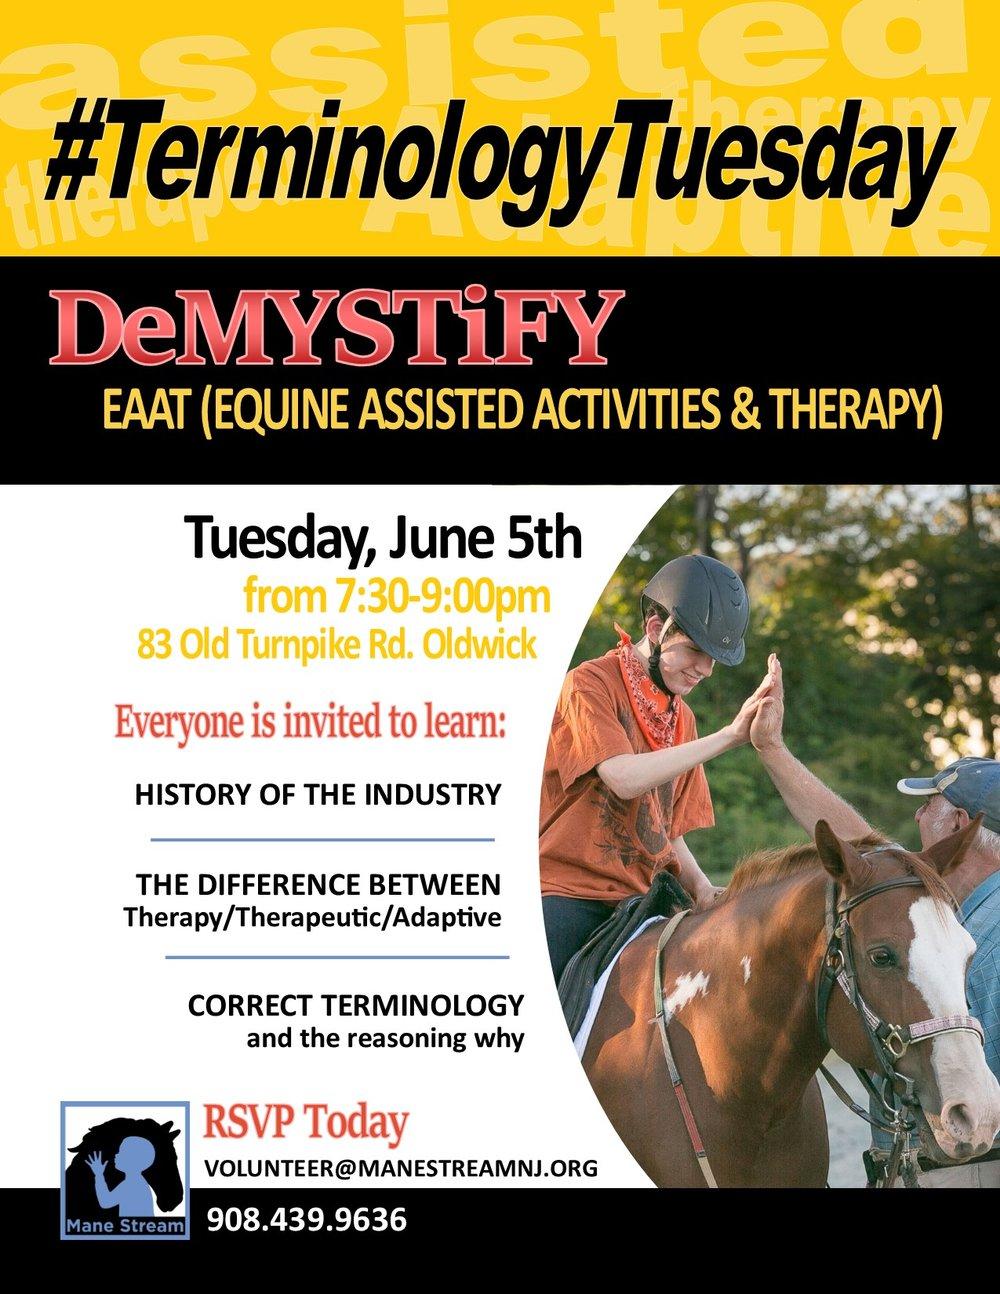 #terminologytuesday - image.jpg